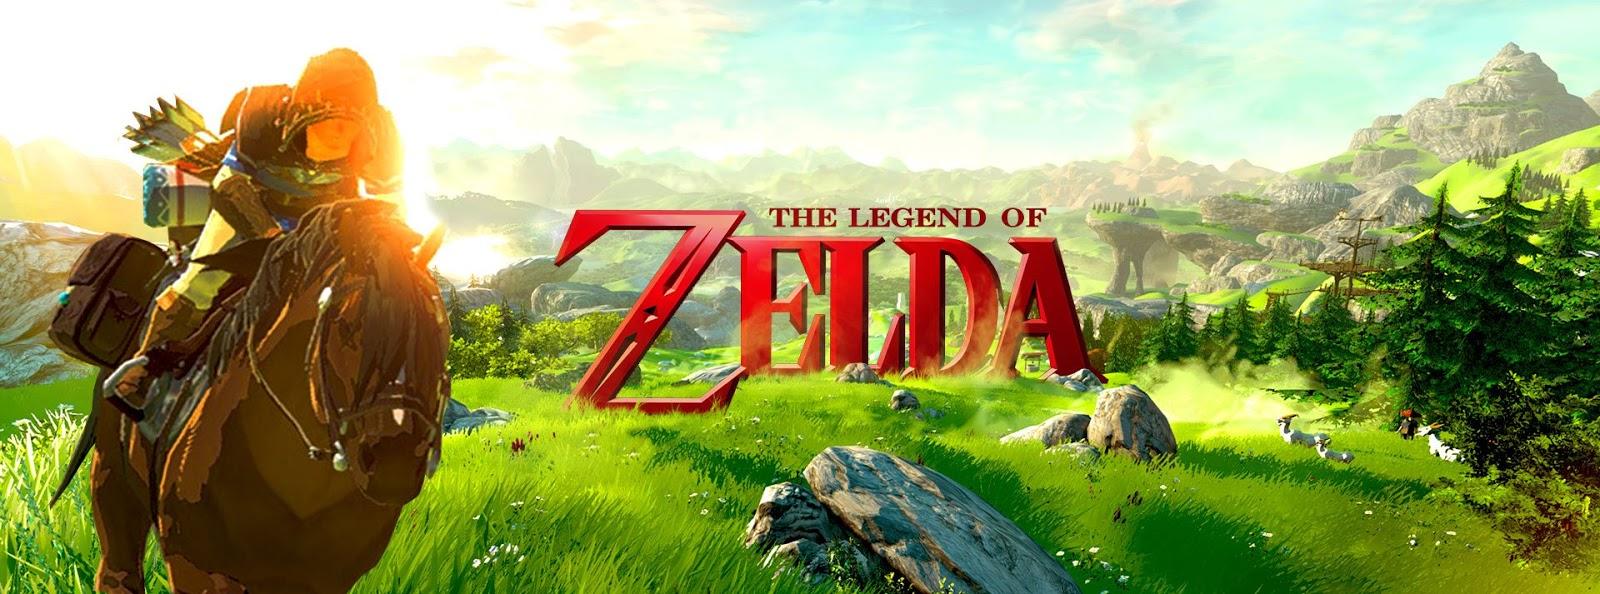 The Legend of Zelda: Twilight Princess HD Wii U Review: The Long ...